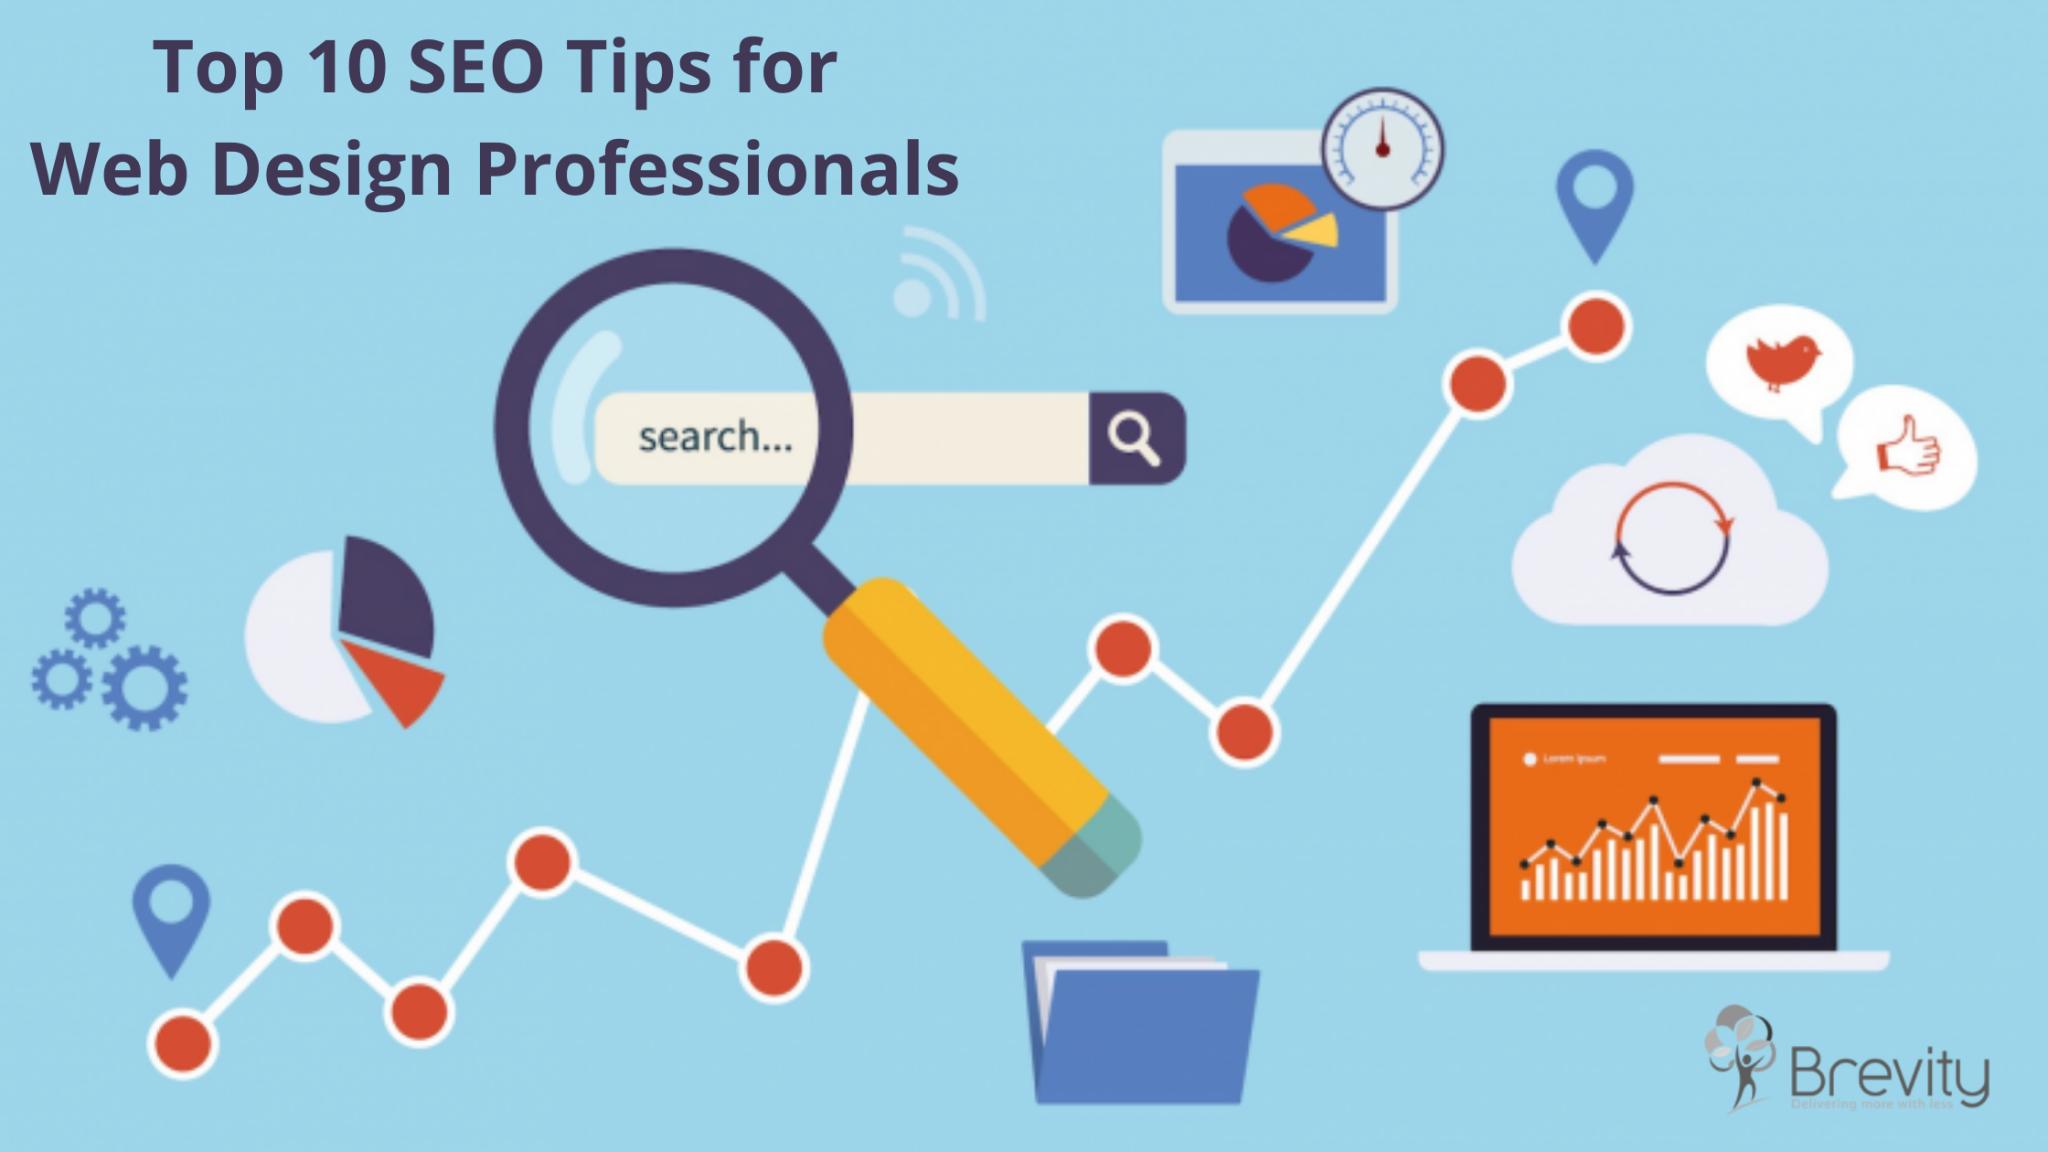 Top 10 SEO Tips for Web Design Professionals